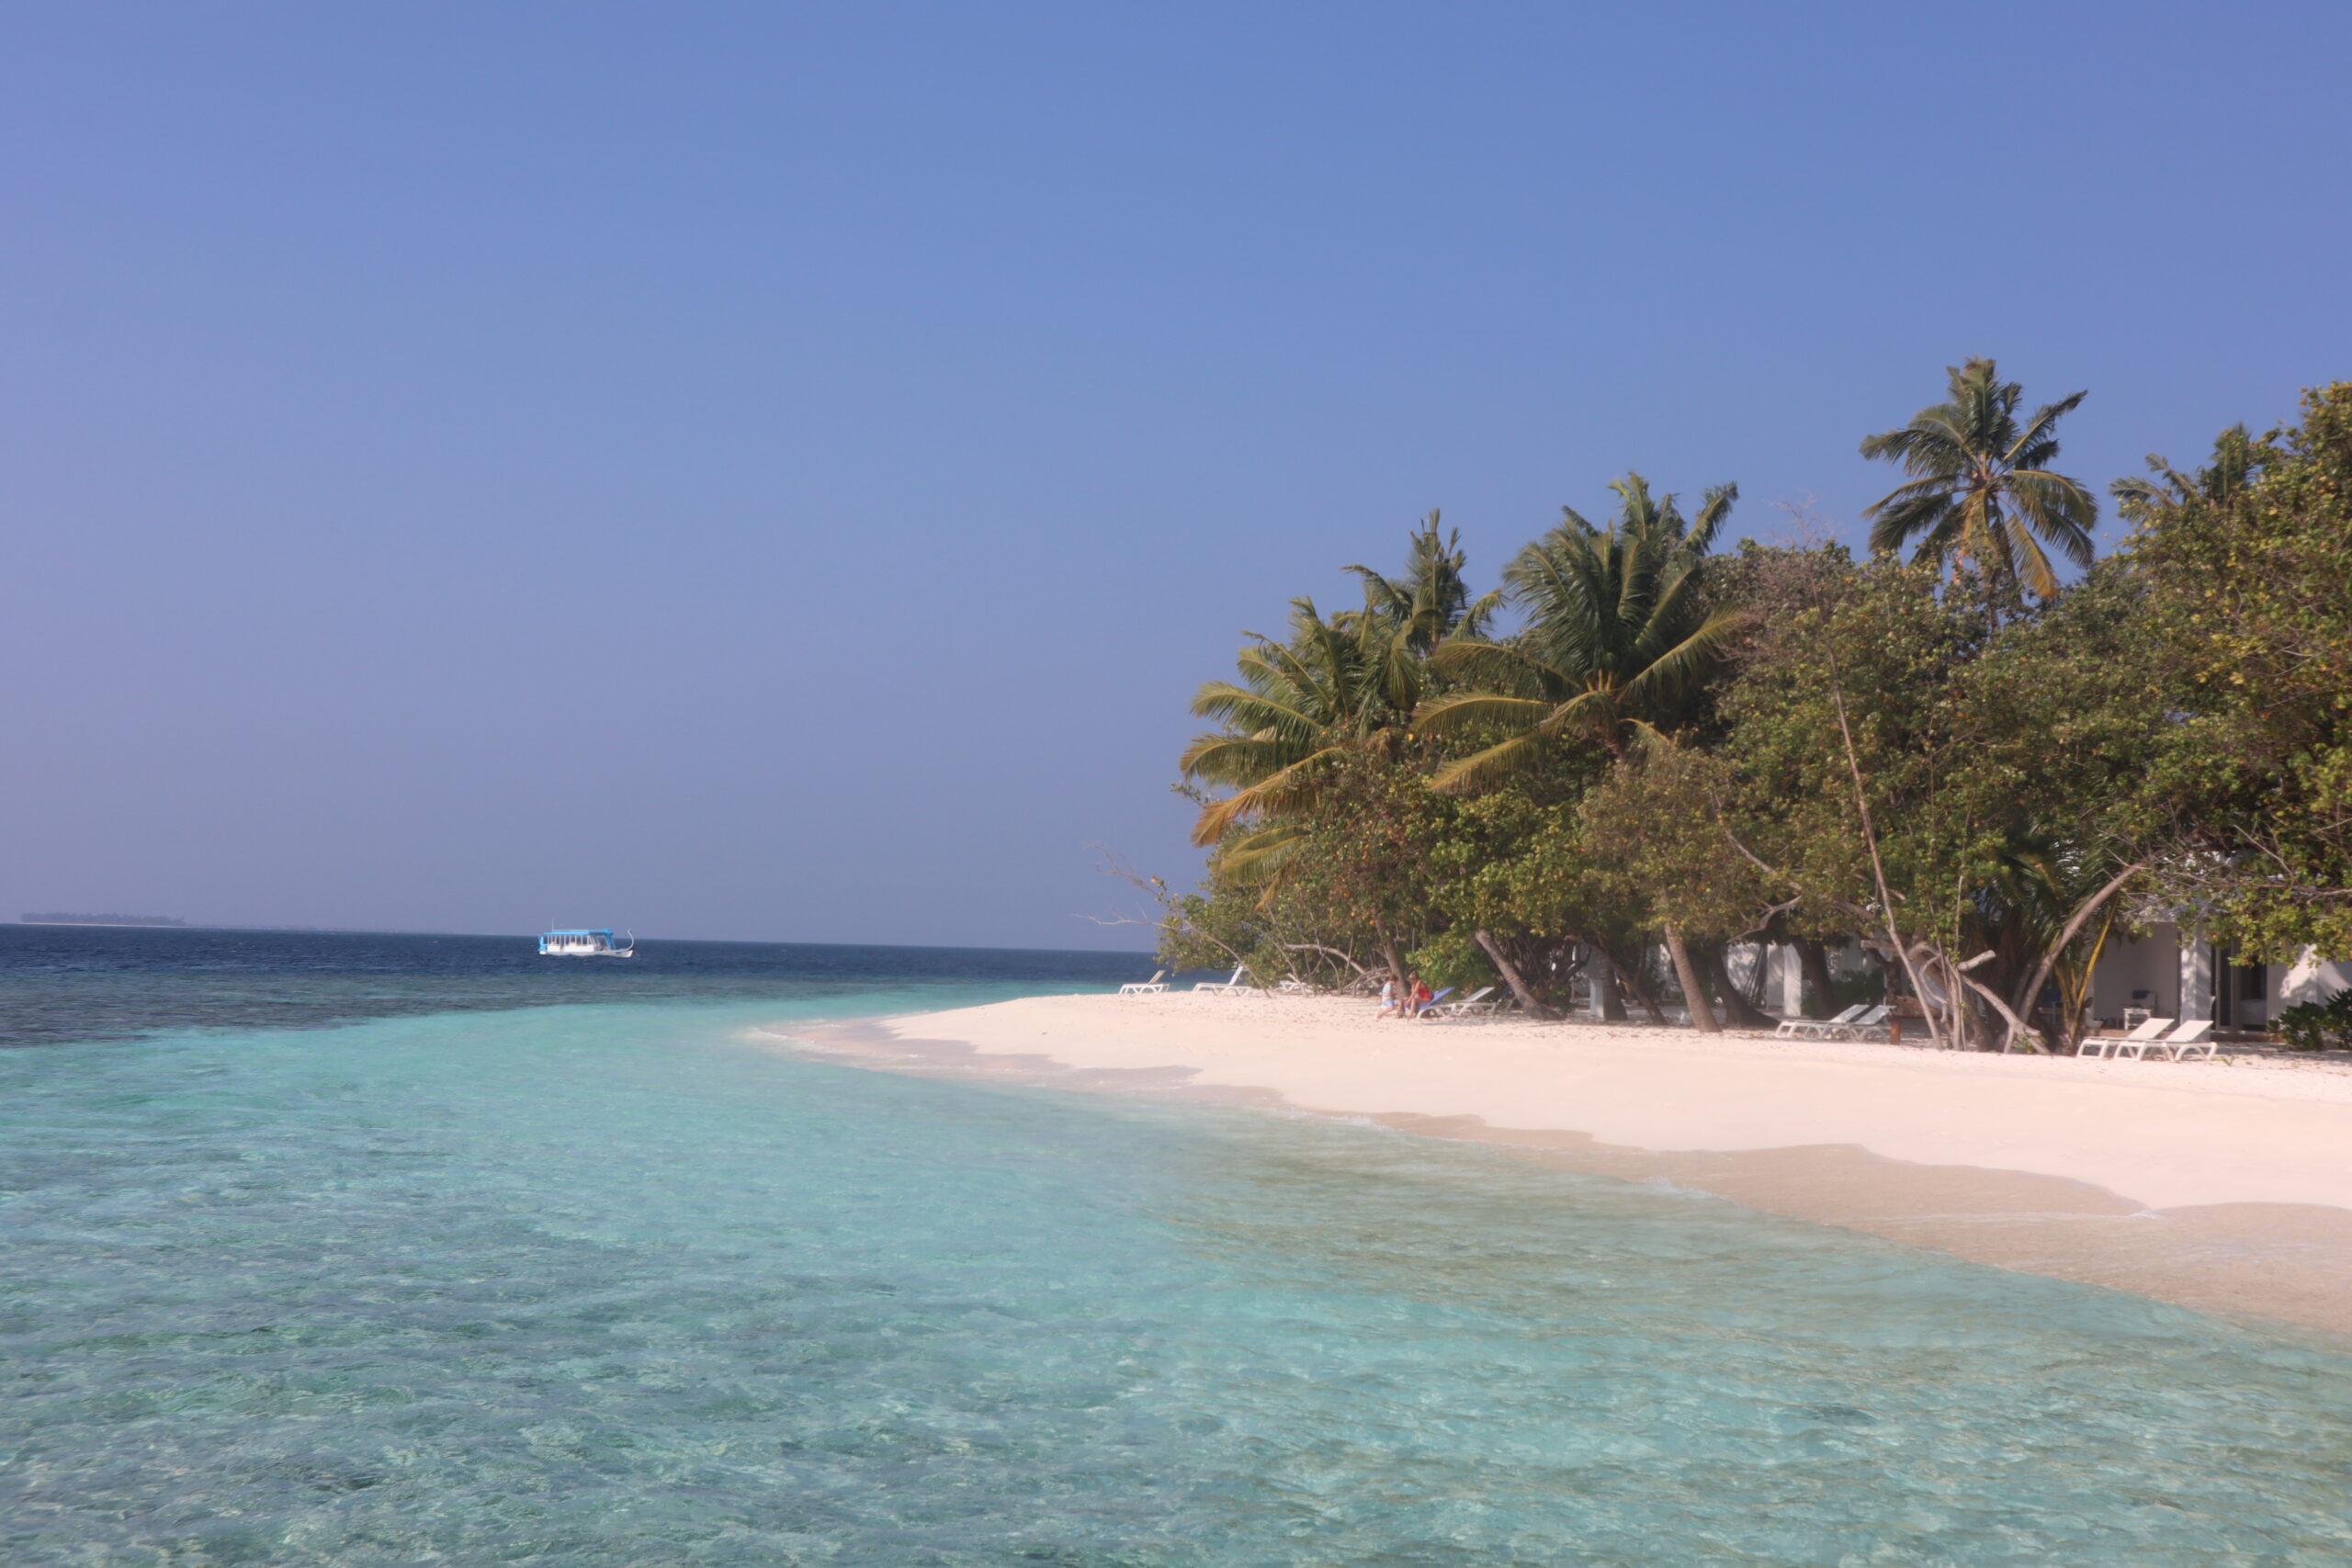 Maldives Heavenly beach